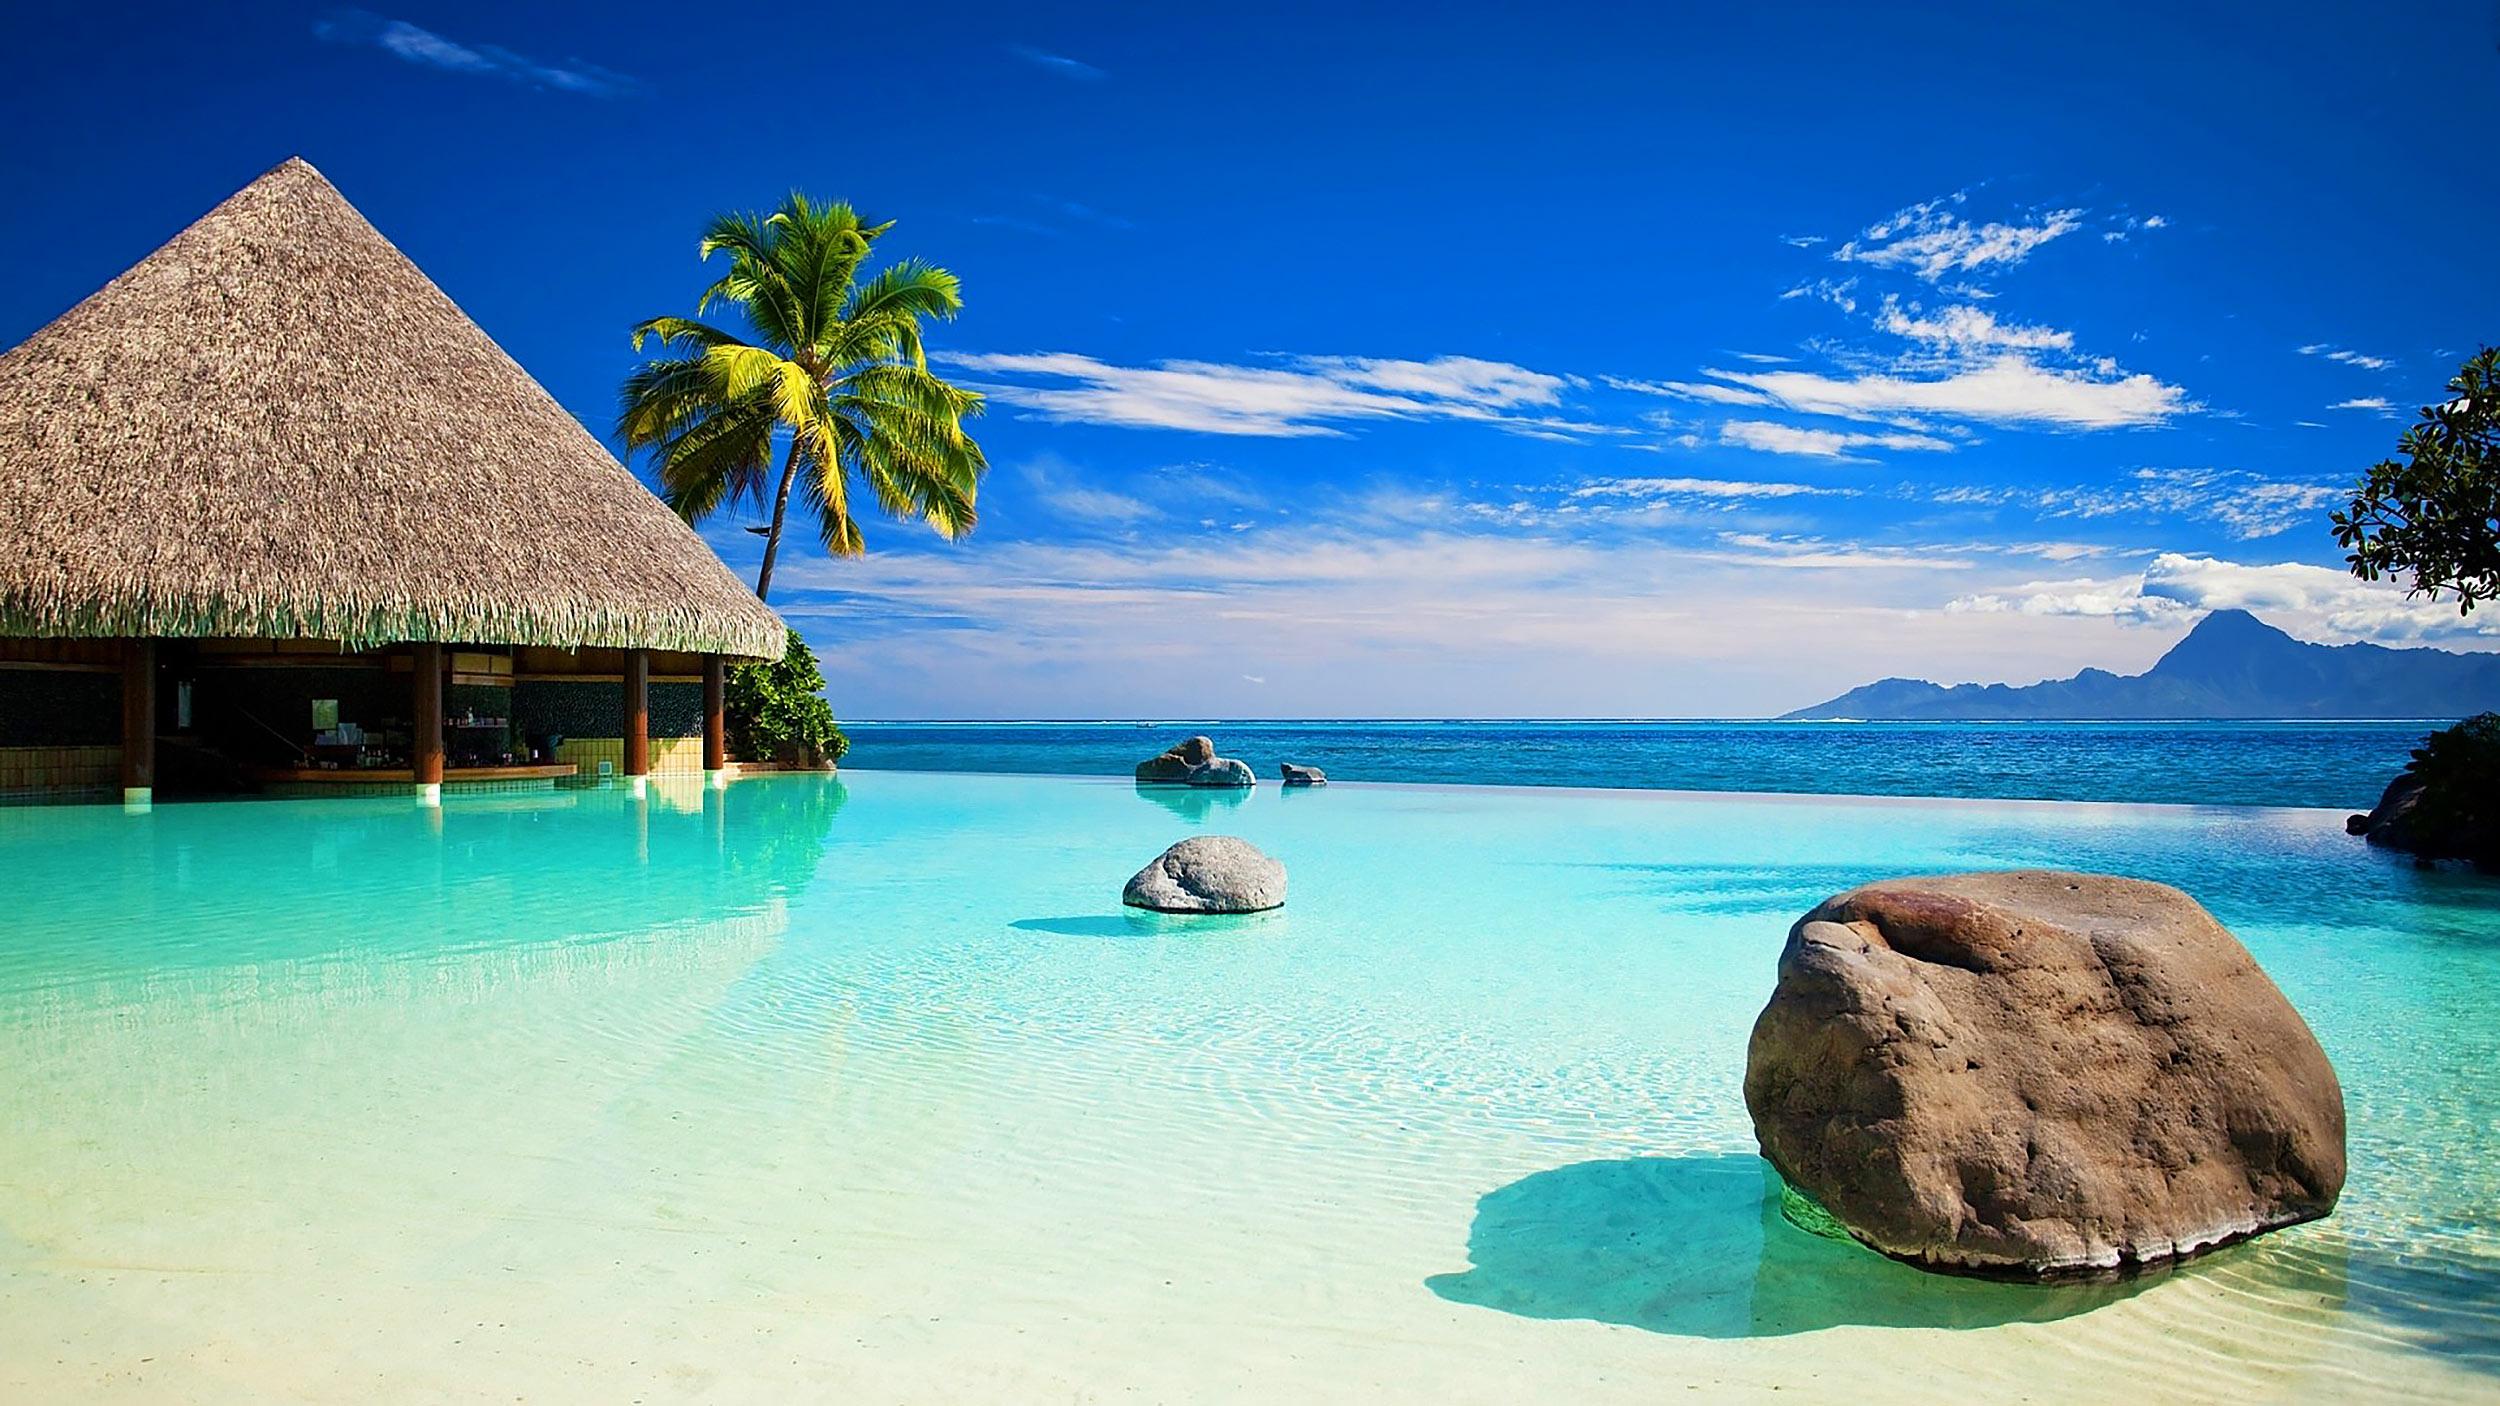 Beautiful Beach Resort Ocean View Of Infinity Pool